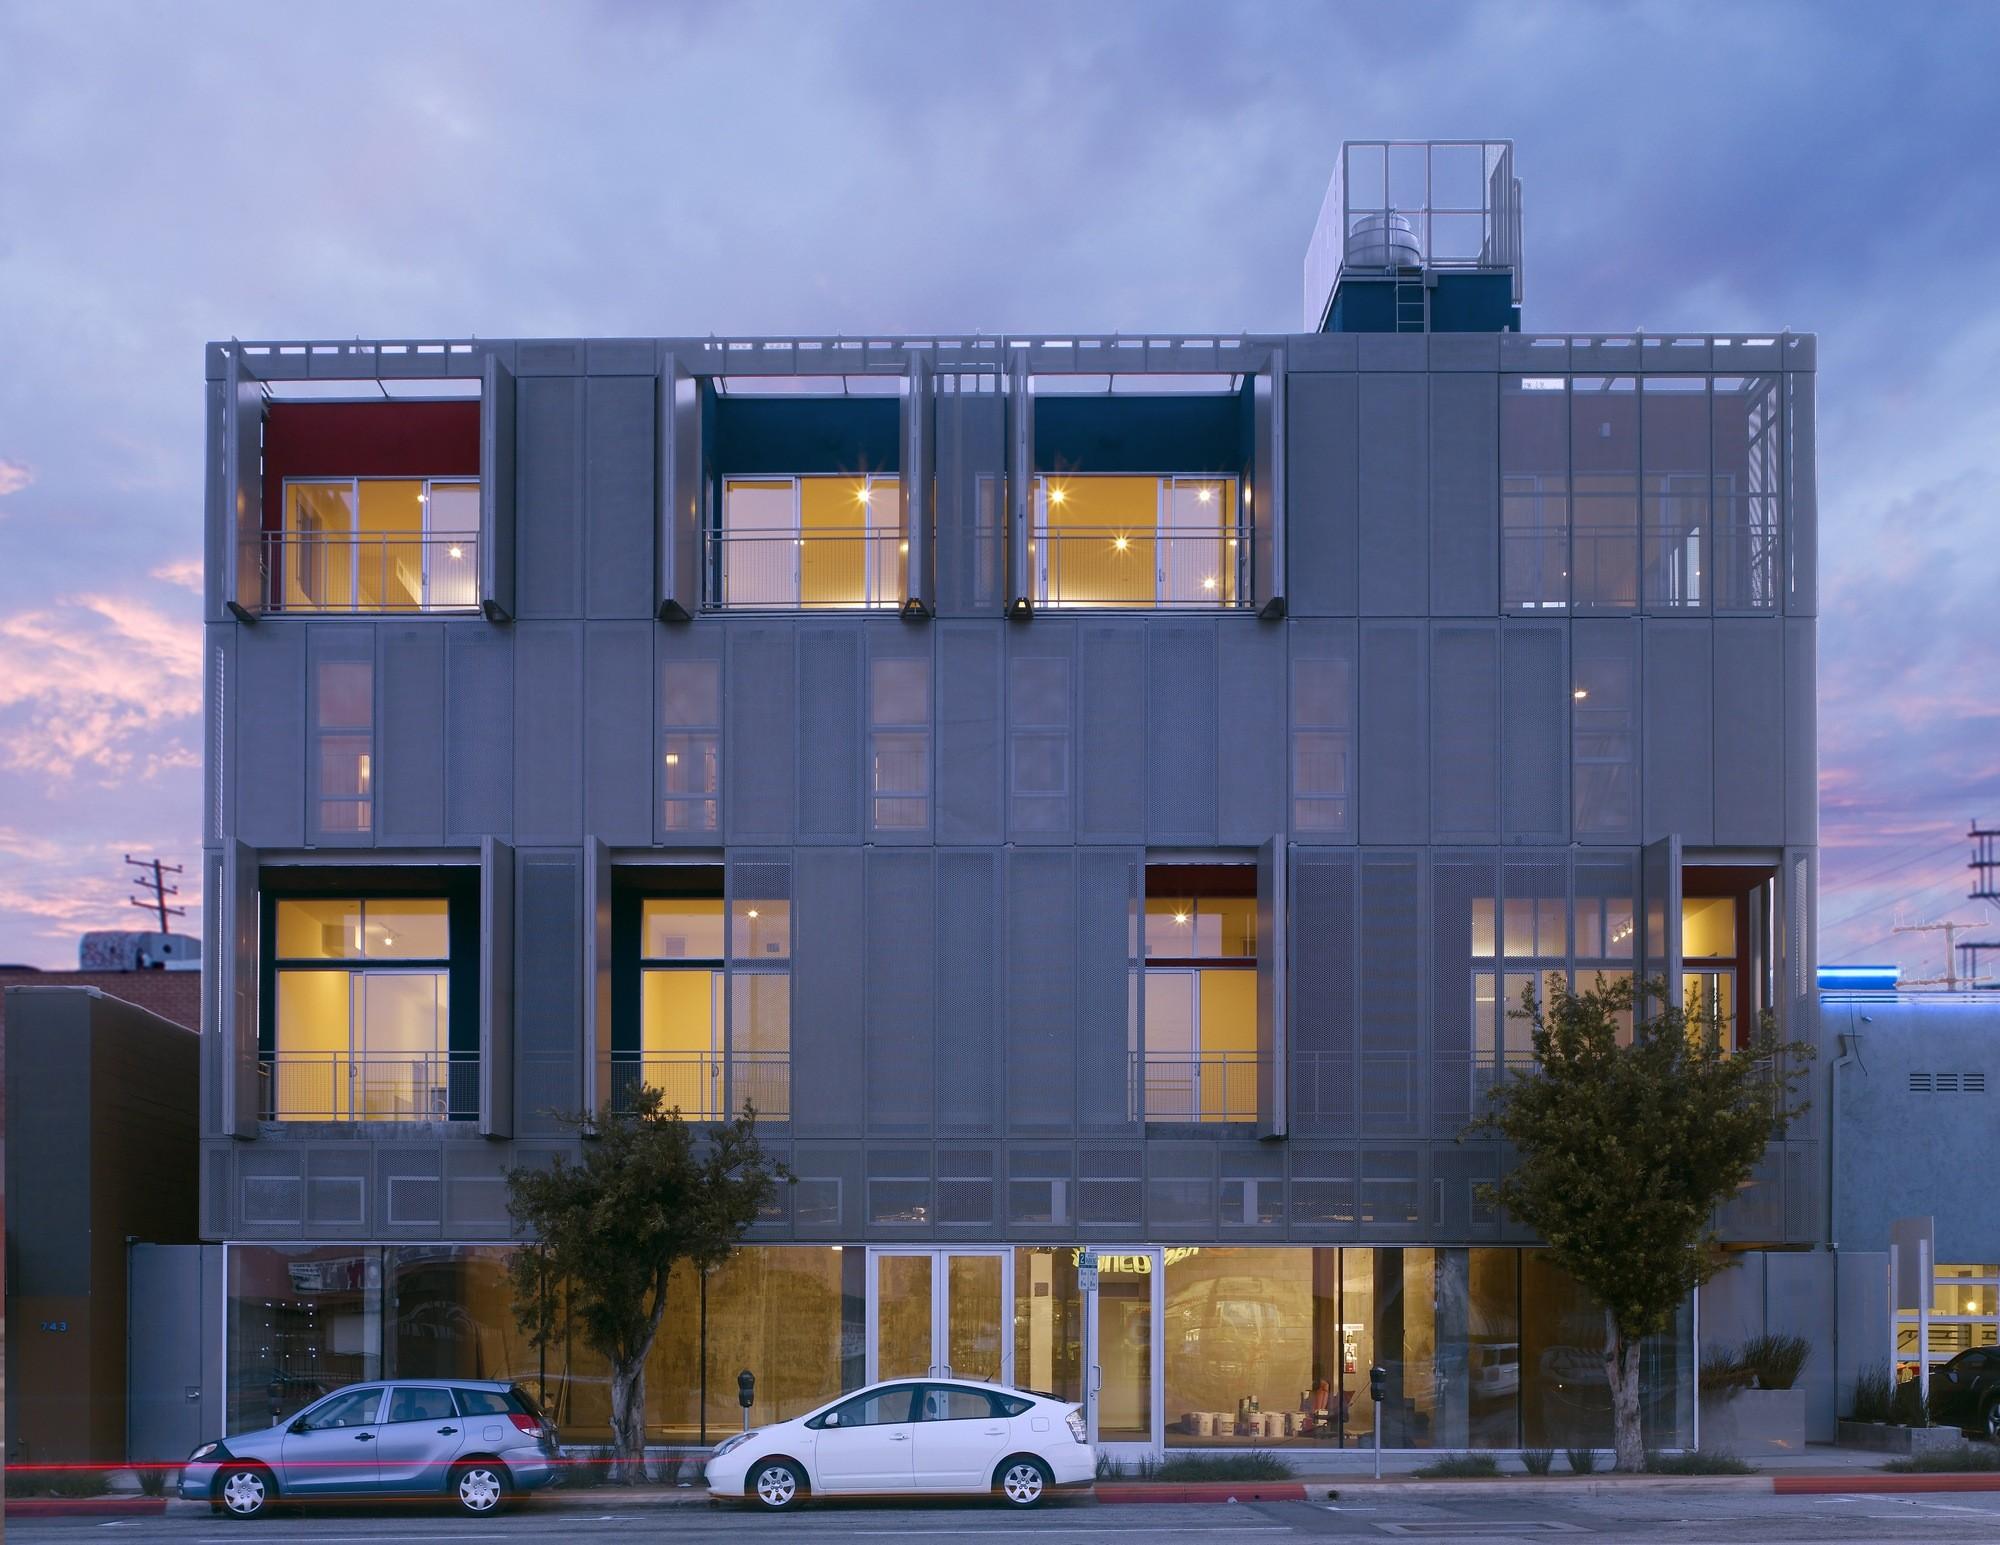 Brooks + Scarpa e Witold Rybczynski recebem Prêmio Cooper-Hewitt , Projeto premiado com o AIA 2014 Habitação: Cherokee Studios / Brooks + Scarpa